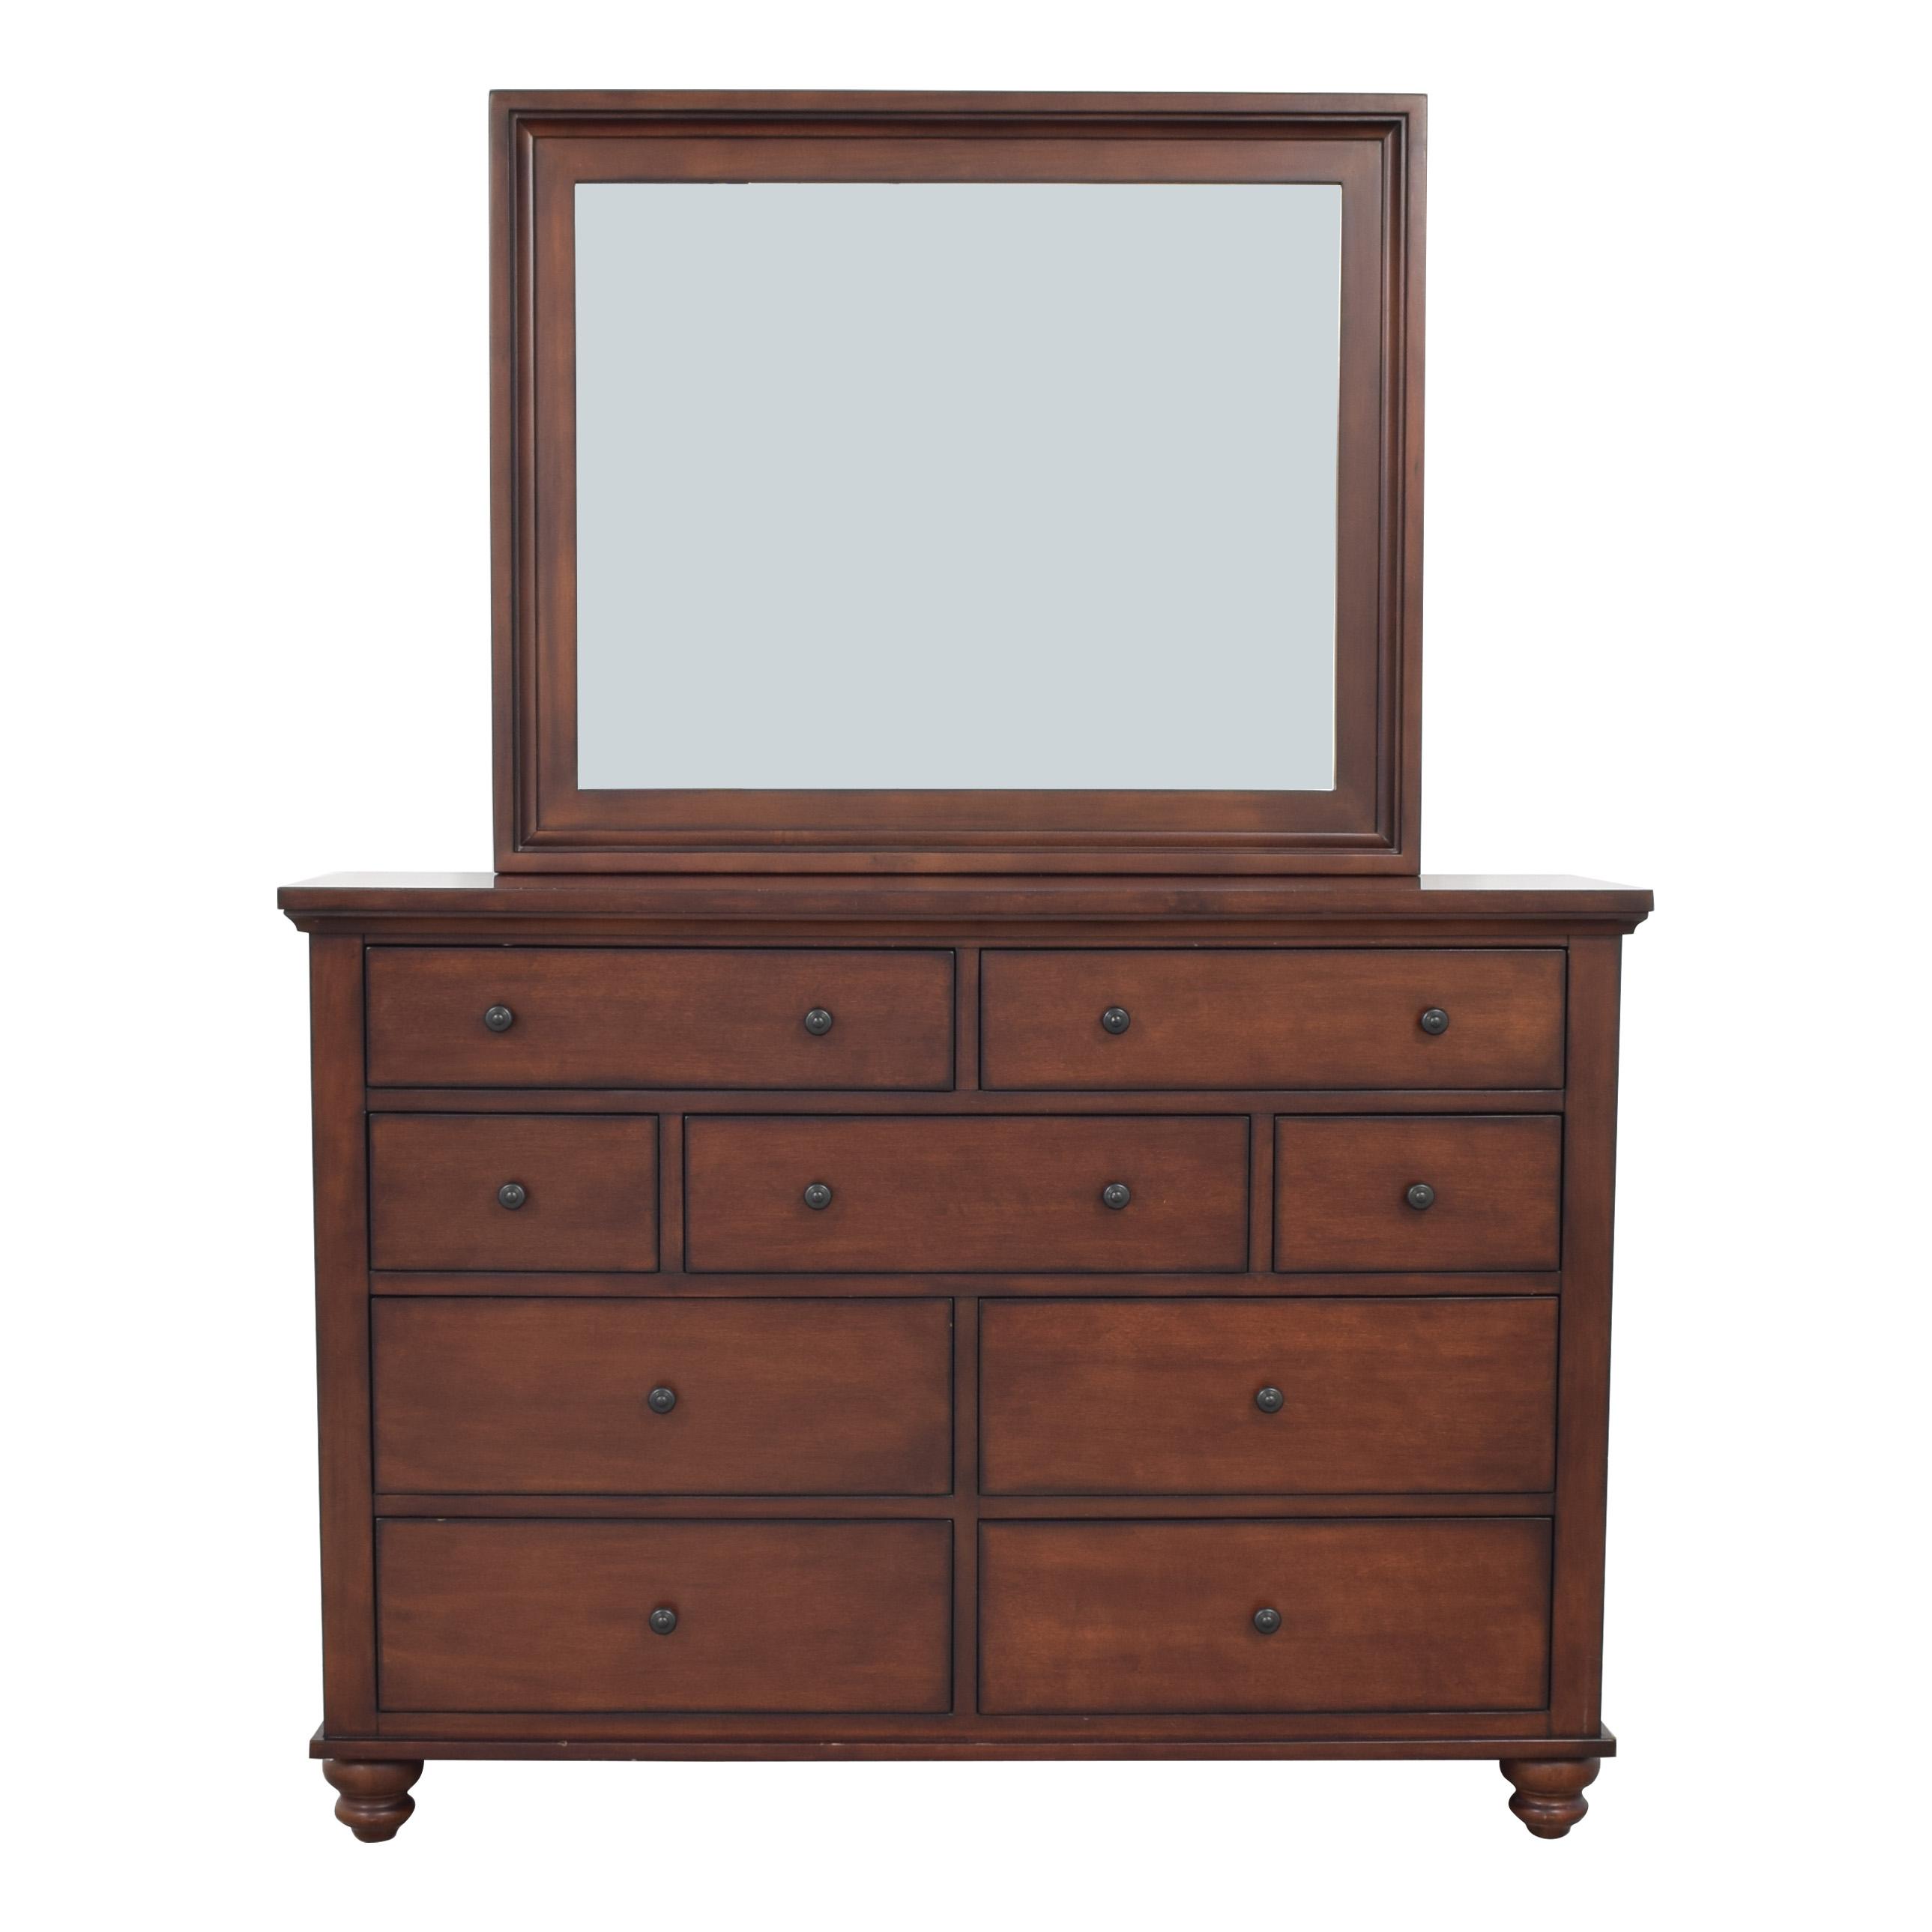 buy Aspen Home Cambridge Dresser with Mirror aspenhome Dressers